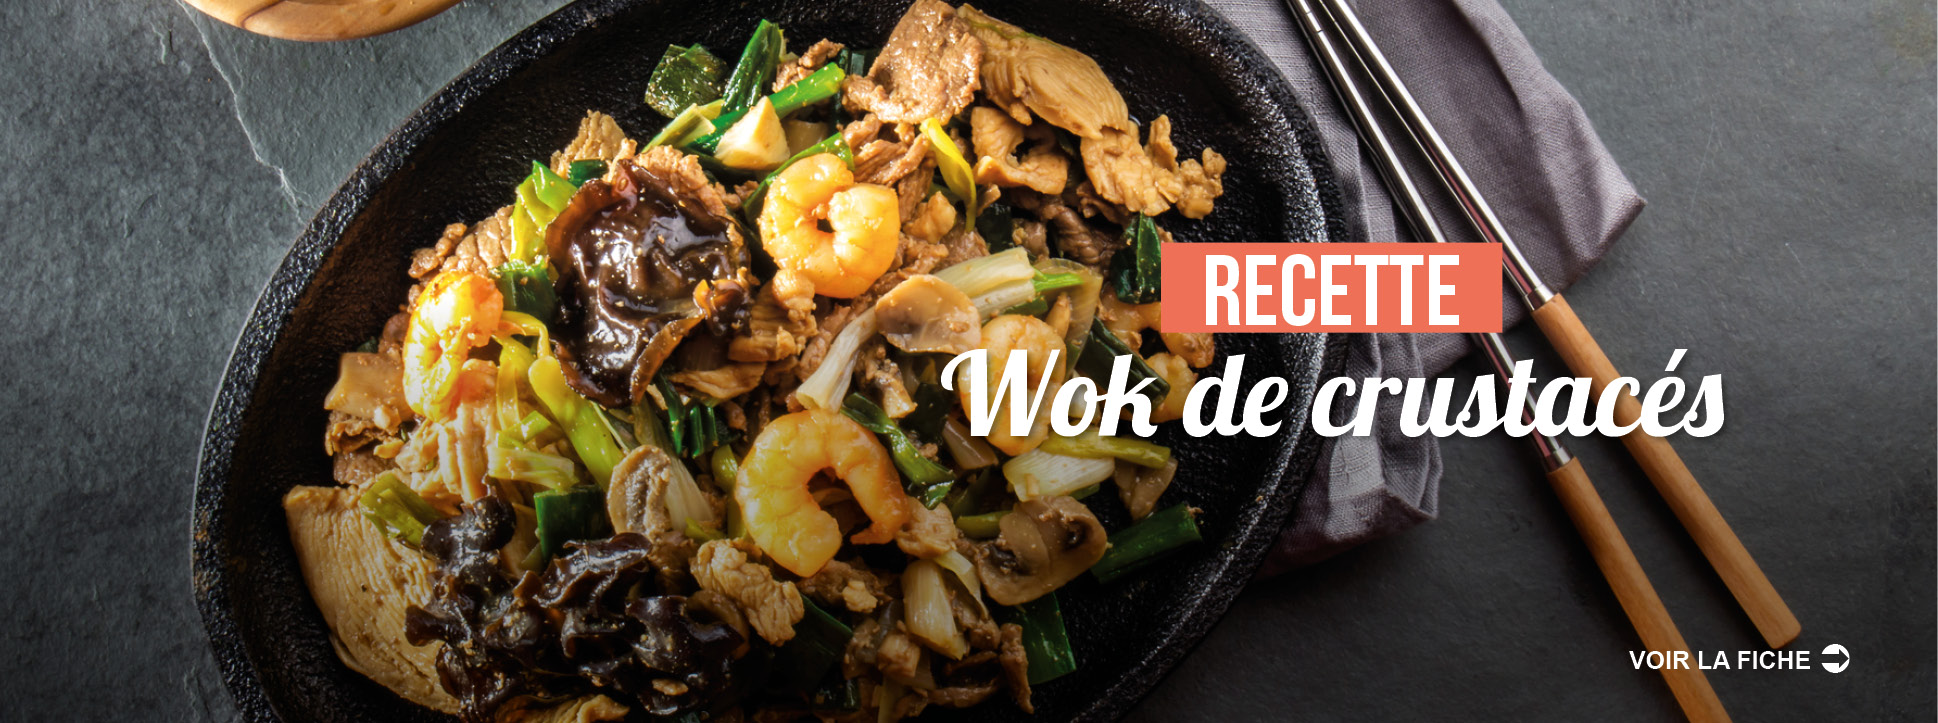 SLIDE-wok-crustacés